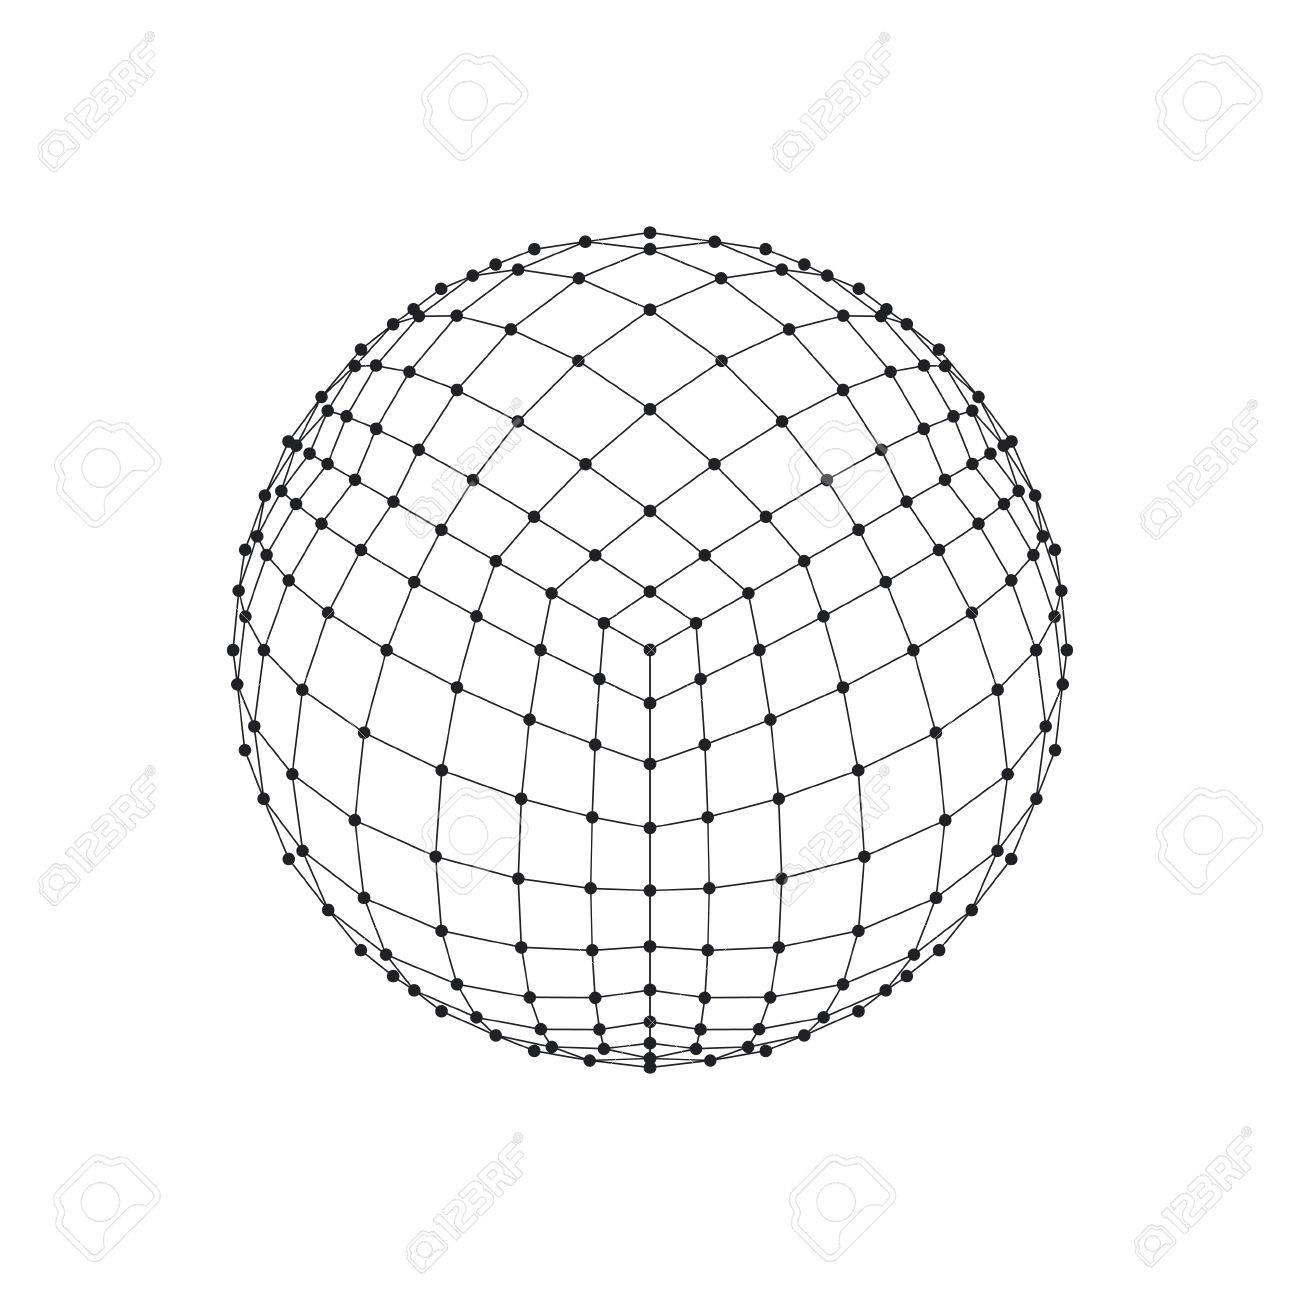 1300x1300 3d Hexahedron Wireframe Mesh Sphere. Network Line, Hud Design